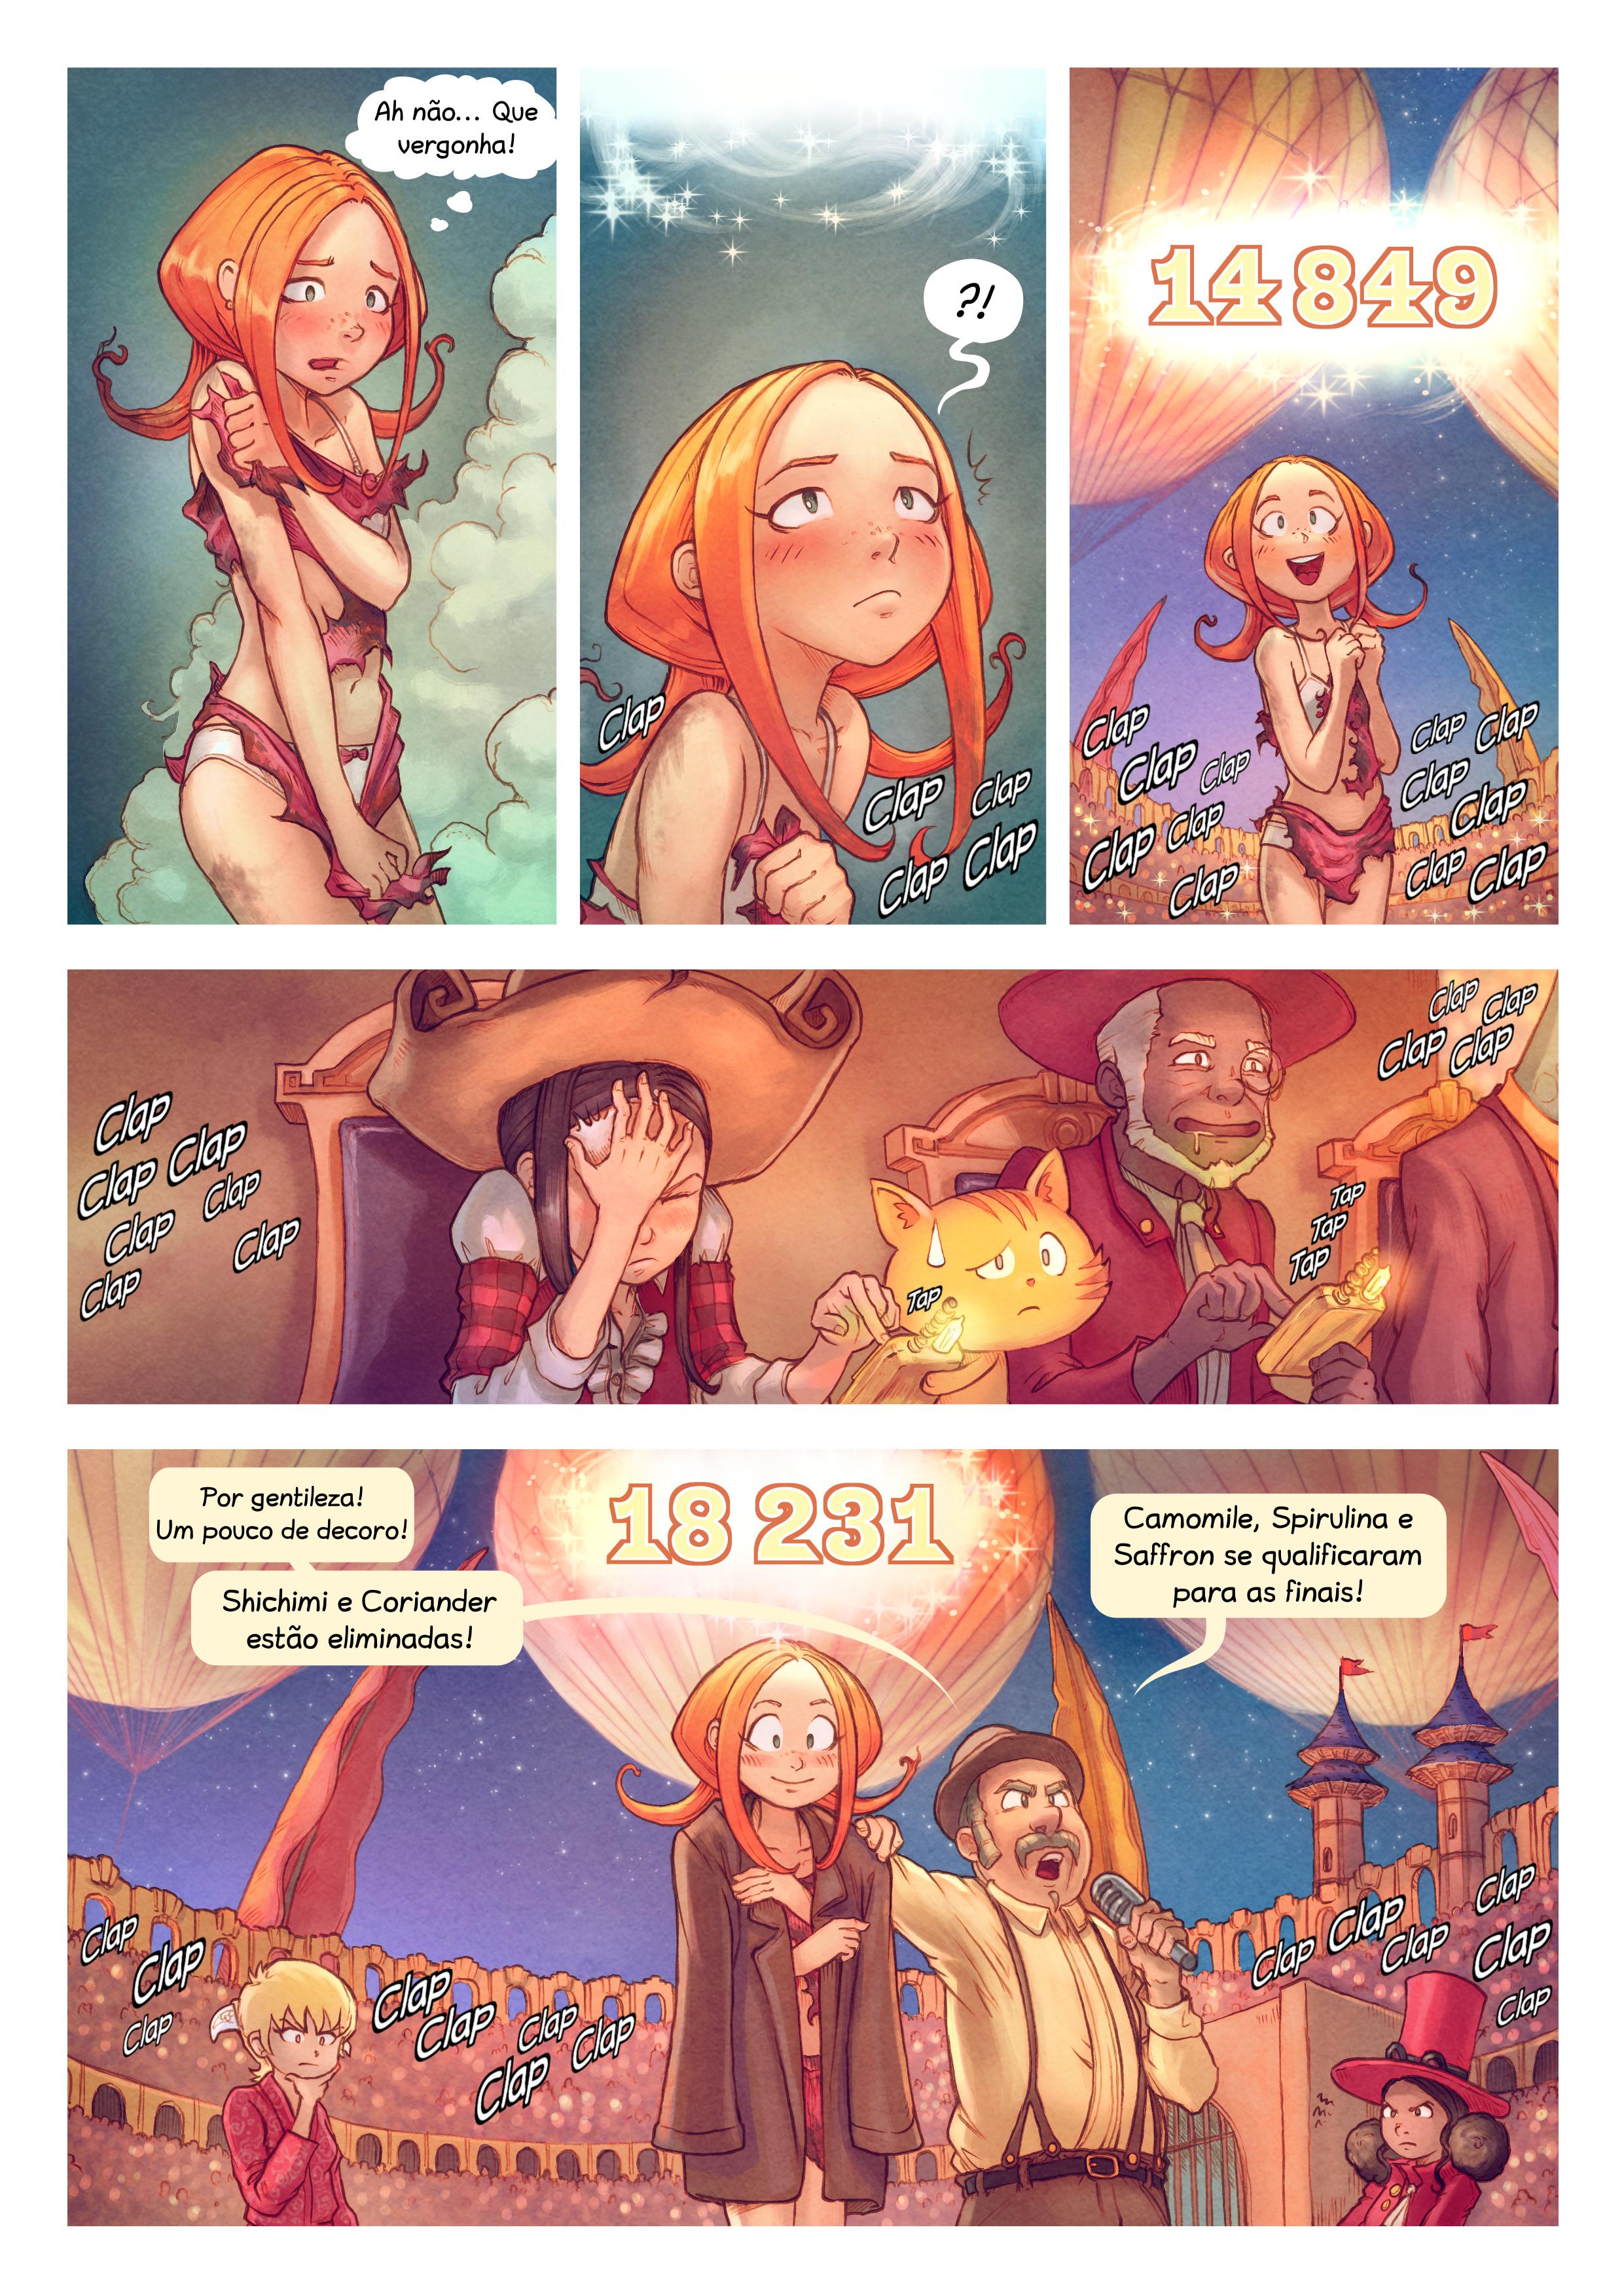 A webcomic page of Pepper&Carrot, episódio 22 [pt], página 9